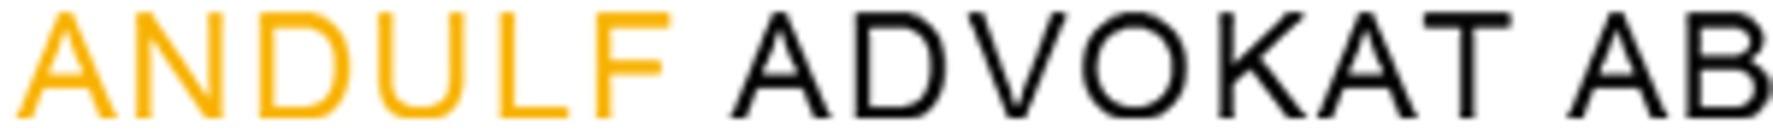 Andulf Advokat AB logo